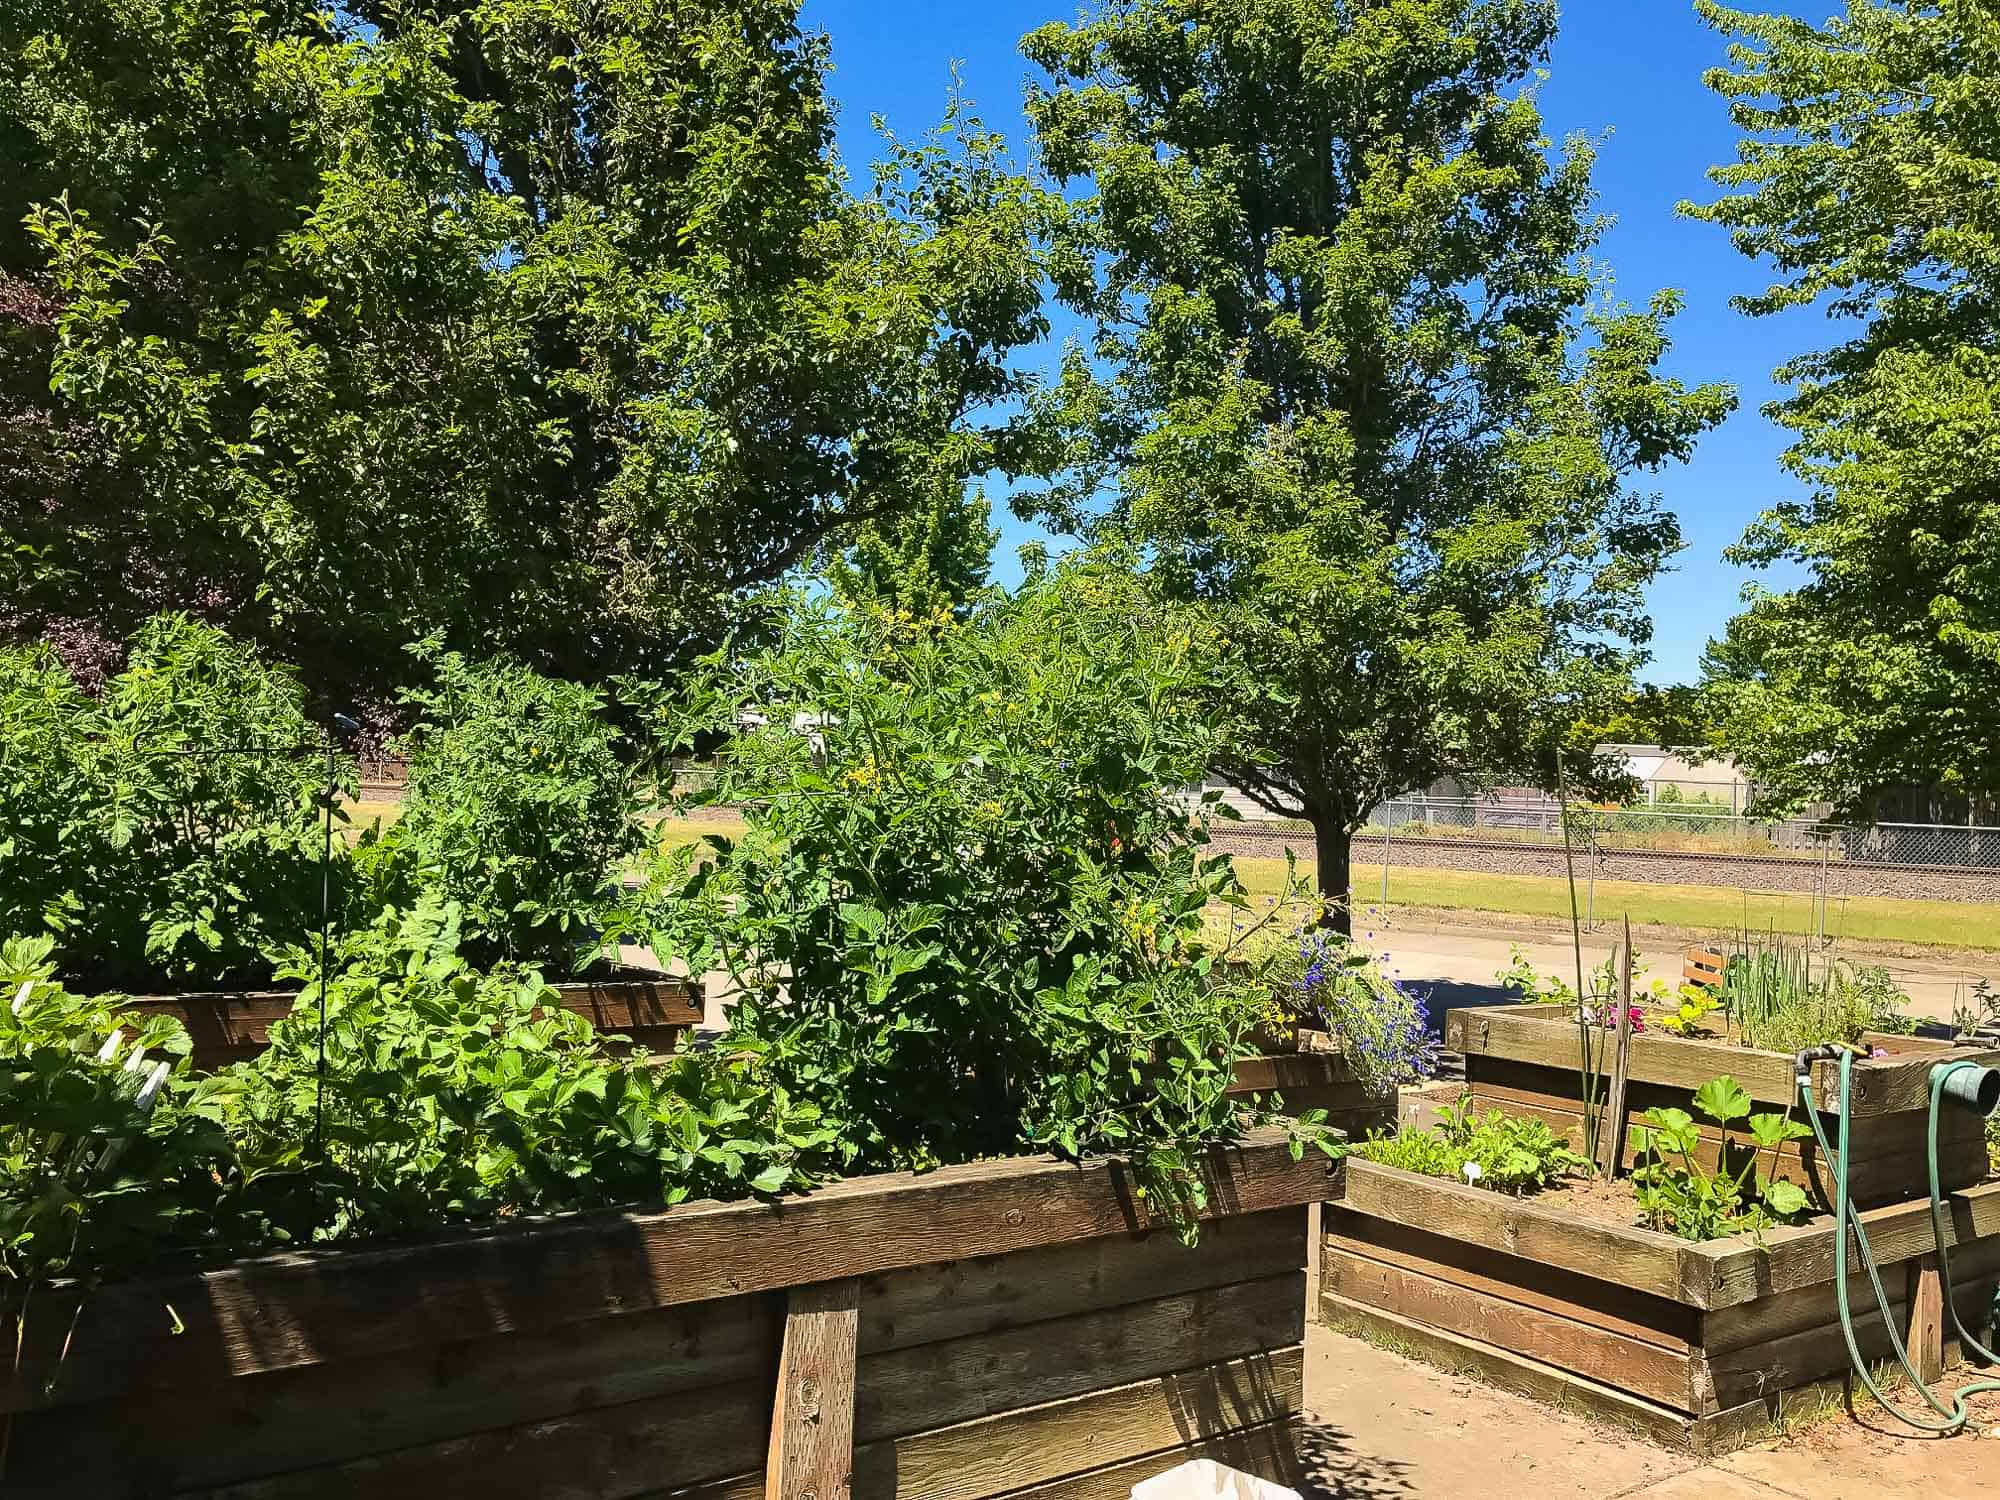 Gardens at Mennonite Village